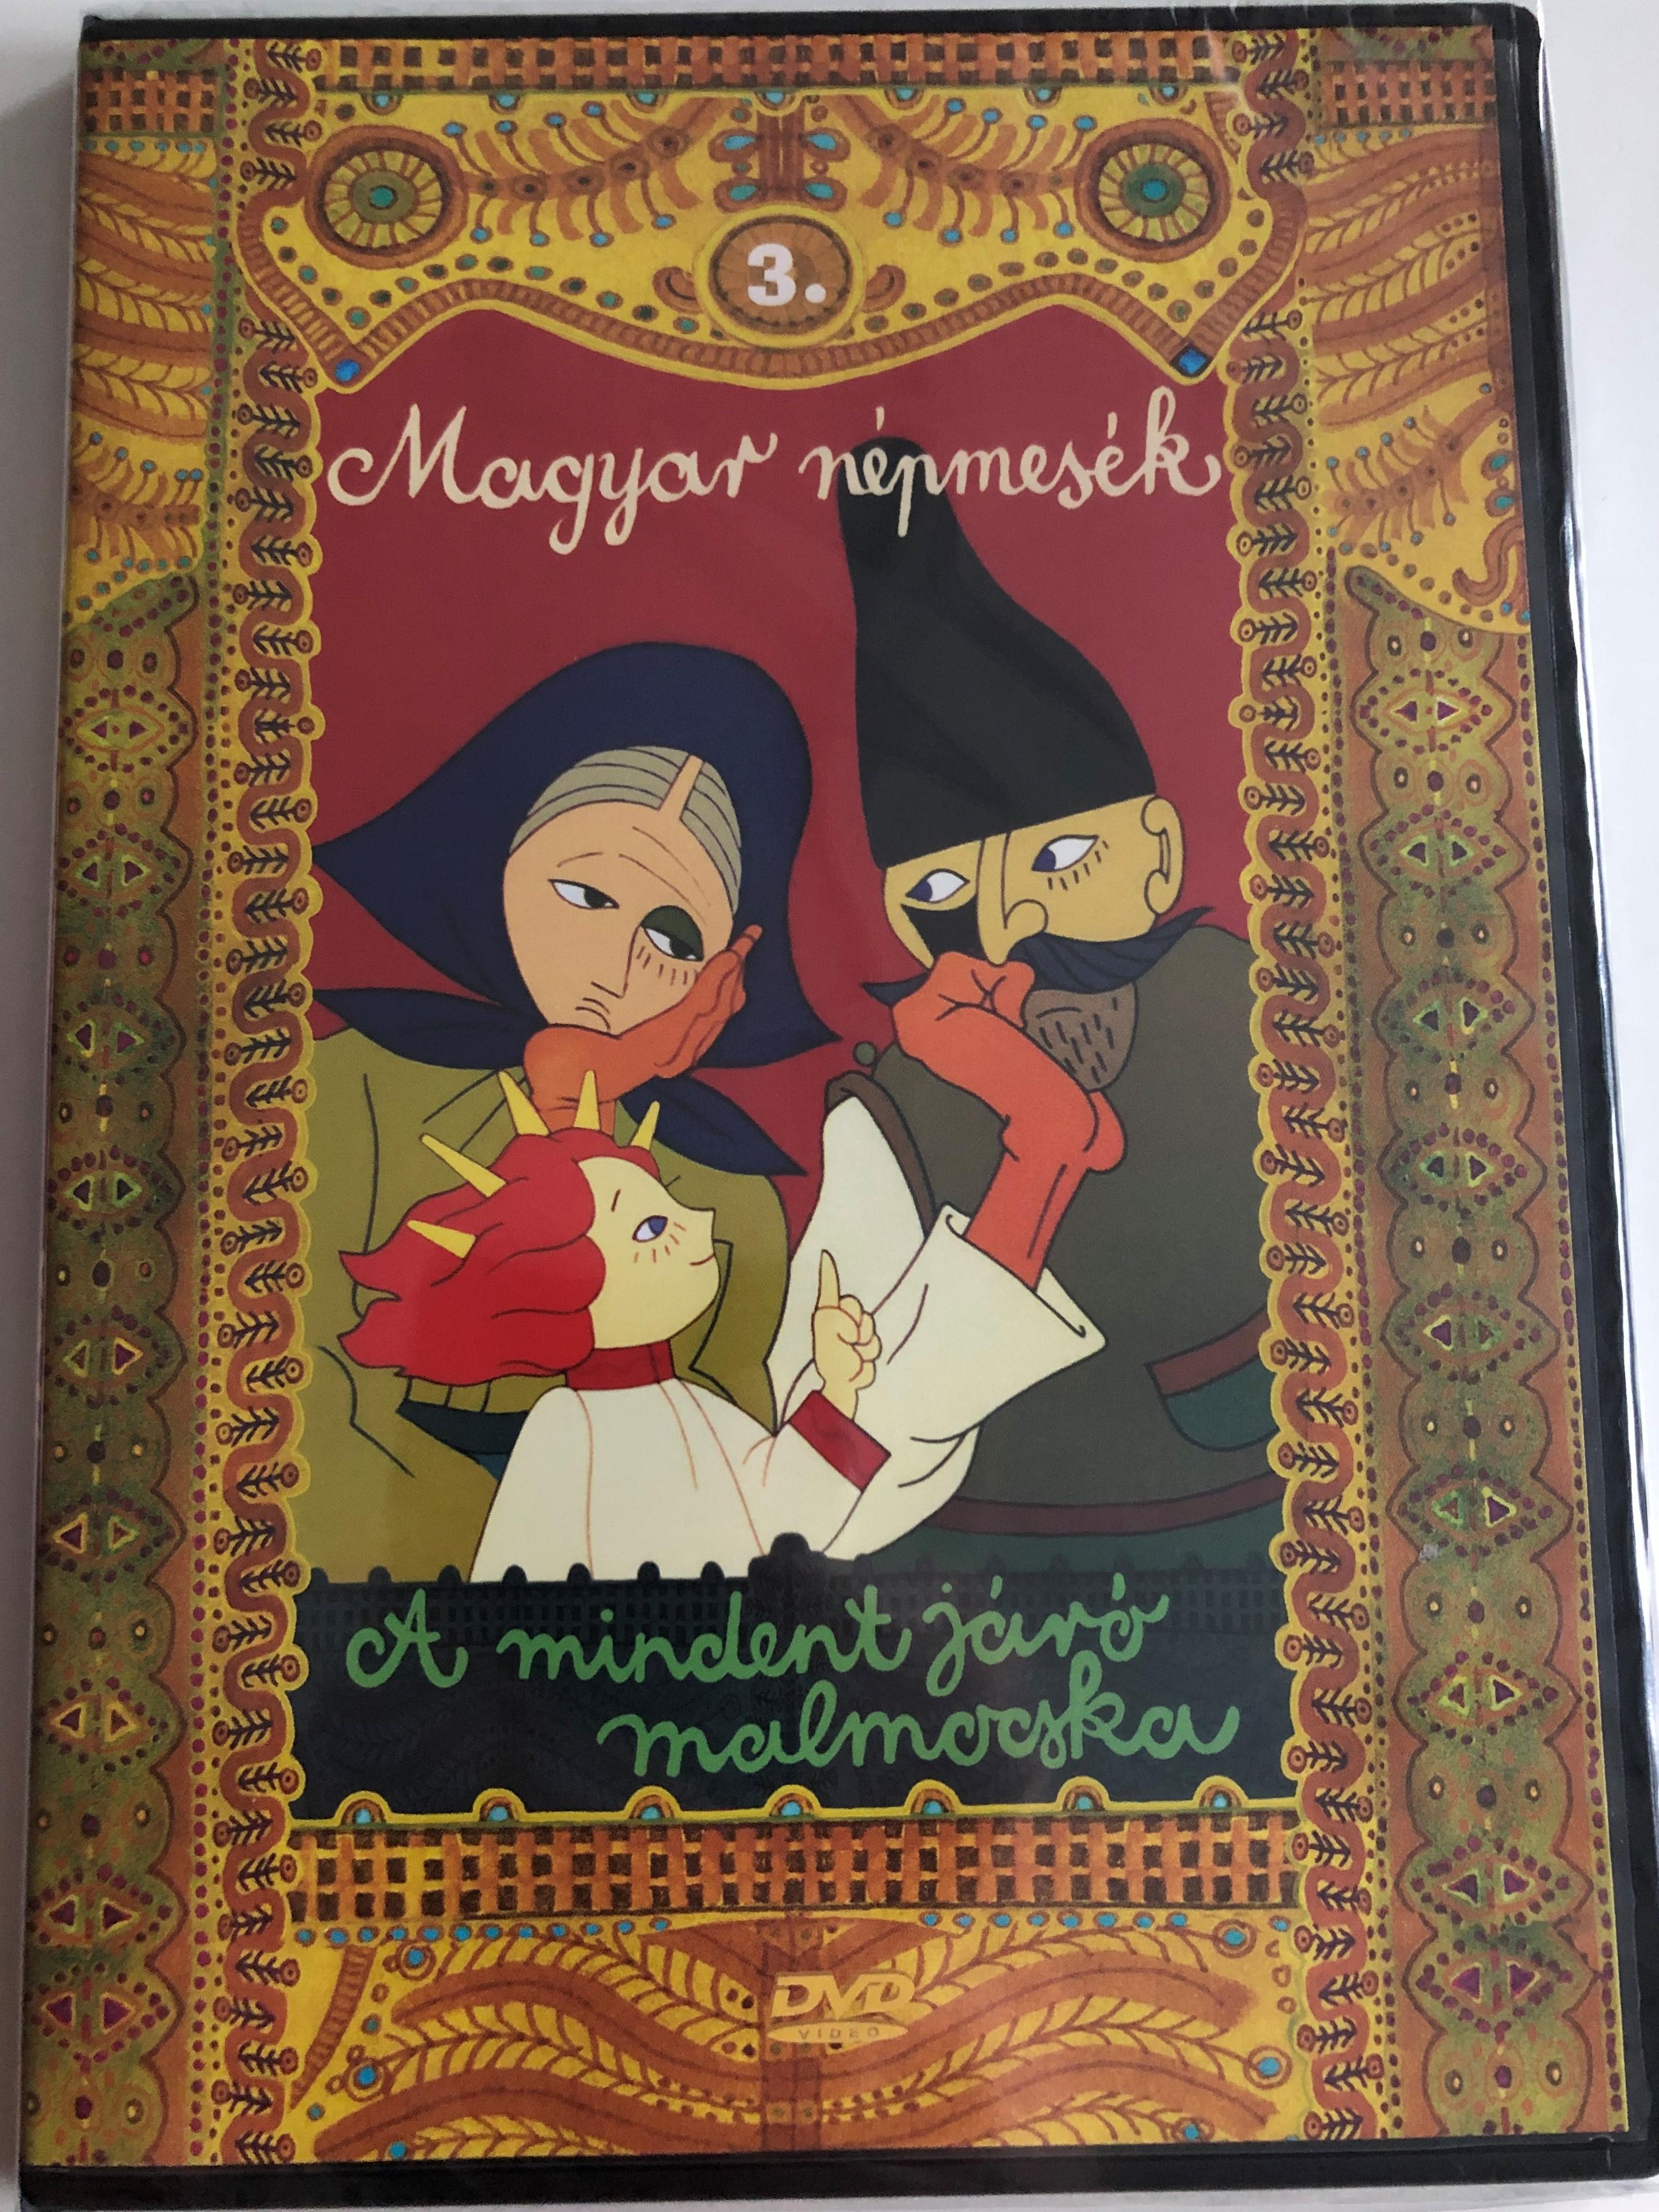 magyar-n-pmes-k-3.-a-mindent-j-r-malmocska-dvd-1984-1985-hungarian-folk-tales-for-children-directed-by-jankovics-marcell-haui-j-zsef-1-.jpg